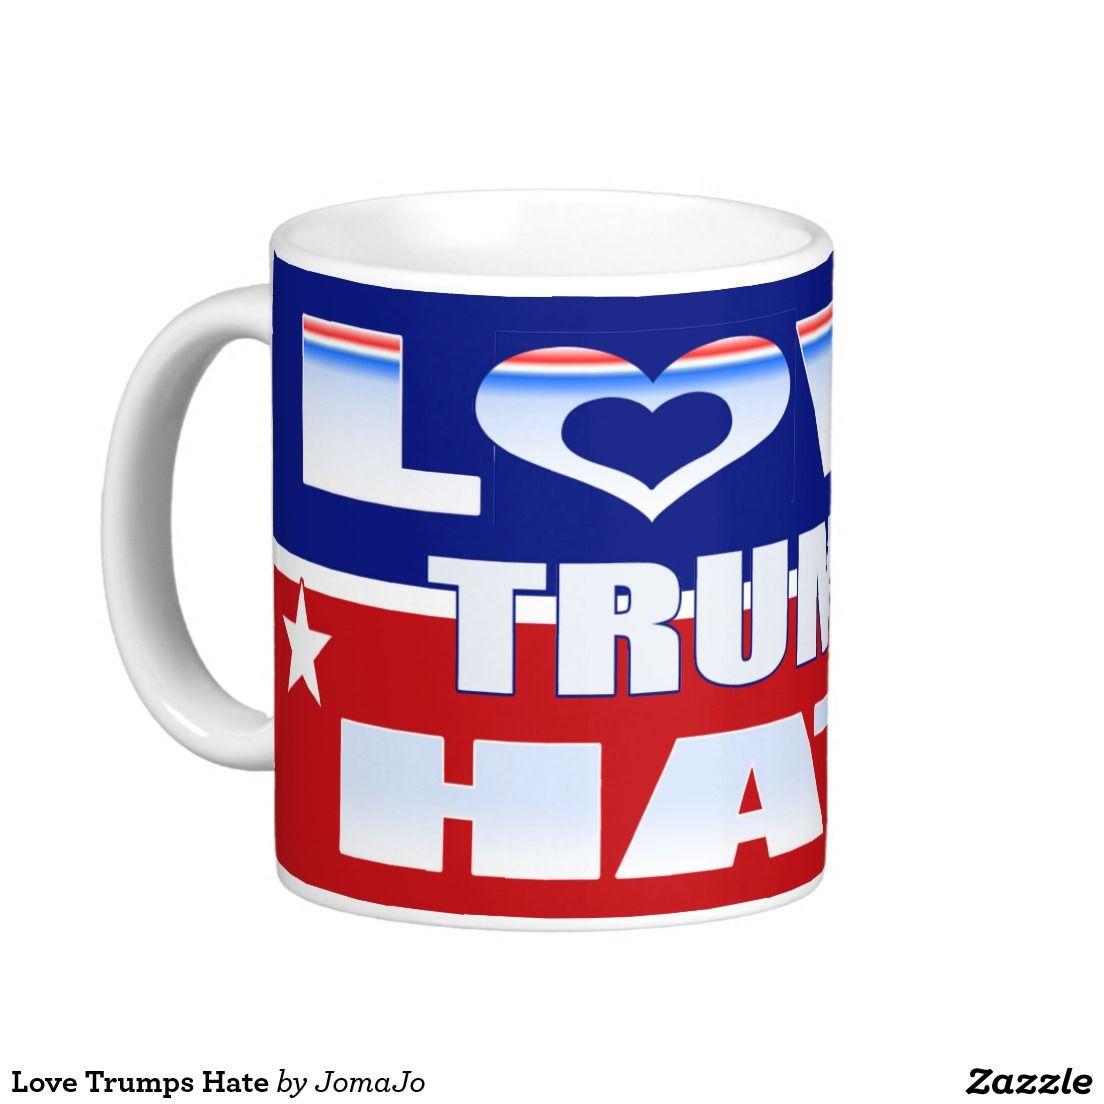 Love Trumps Hate Coffee Mug #lovetrumpshate #hillary2016 #jomazart